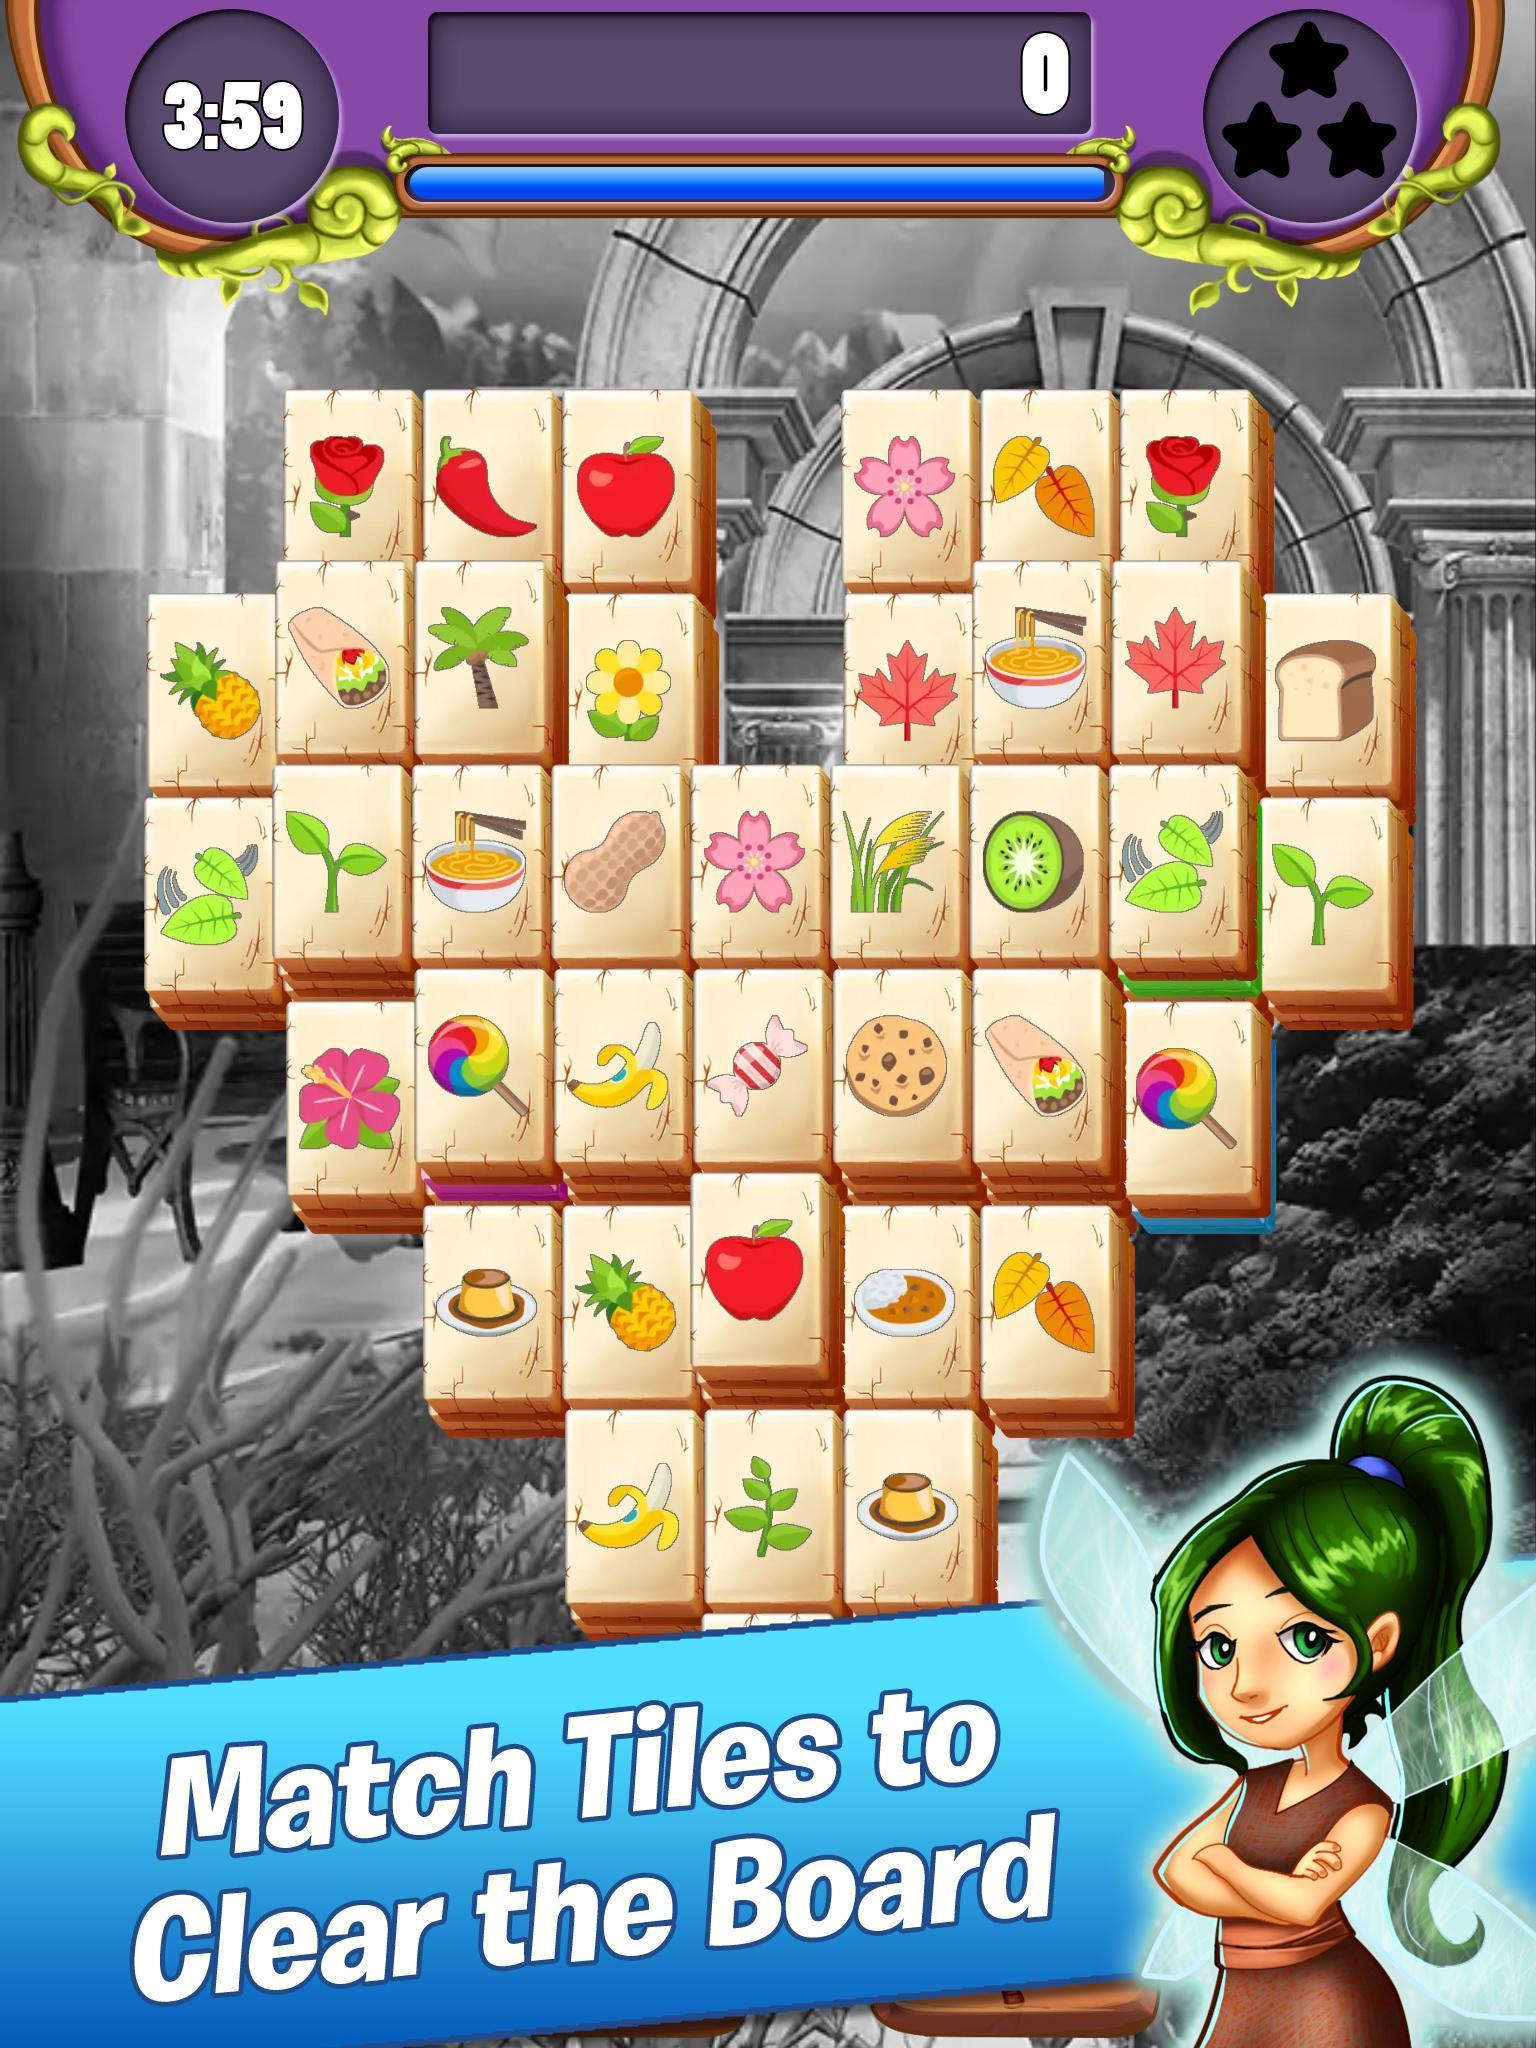 Mahjong - Mermaid Quest - Sirens of the Deep 1.0.42 Screenshot 1